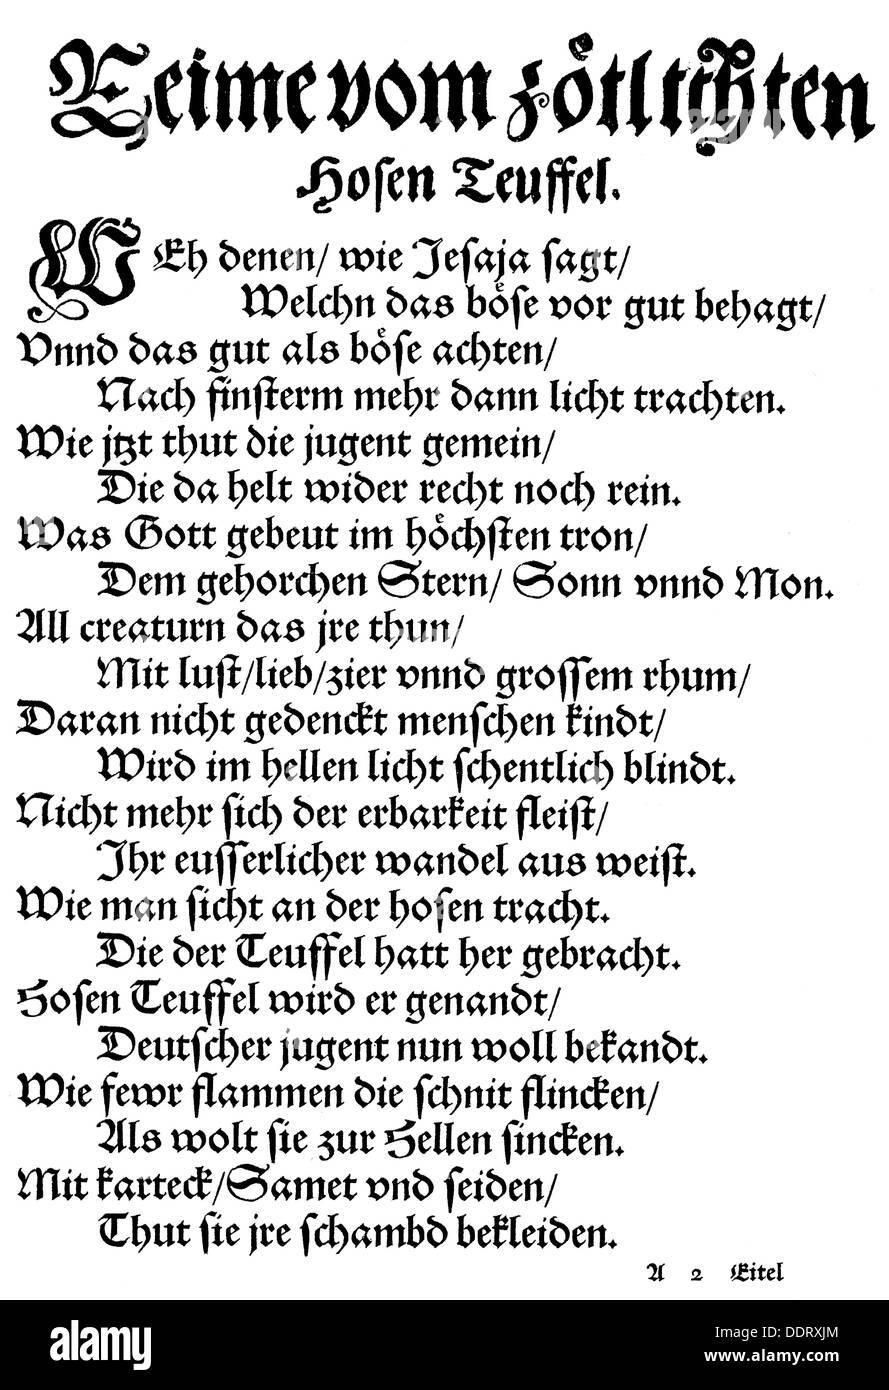 Musculus, Andreas, 29.11.1514 - 29.9.1581, German reformer, works, 'Vom Hosenteufel' (Trouser Devil), Frankfurt an der Oder, 1555, Additional-Rights-Clearances-NA - Stock Image